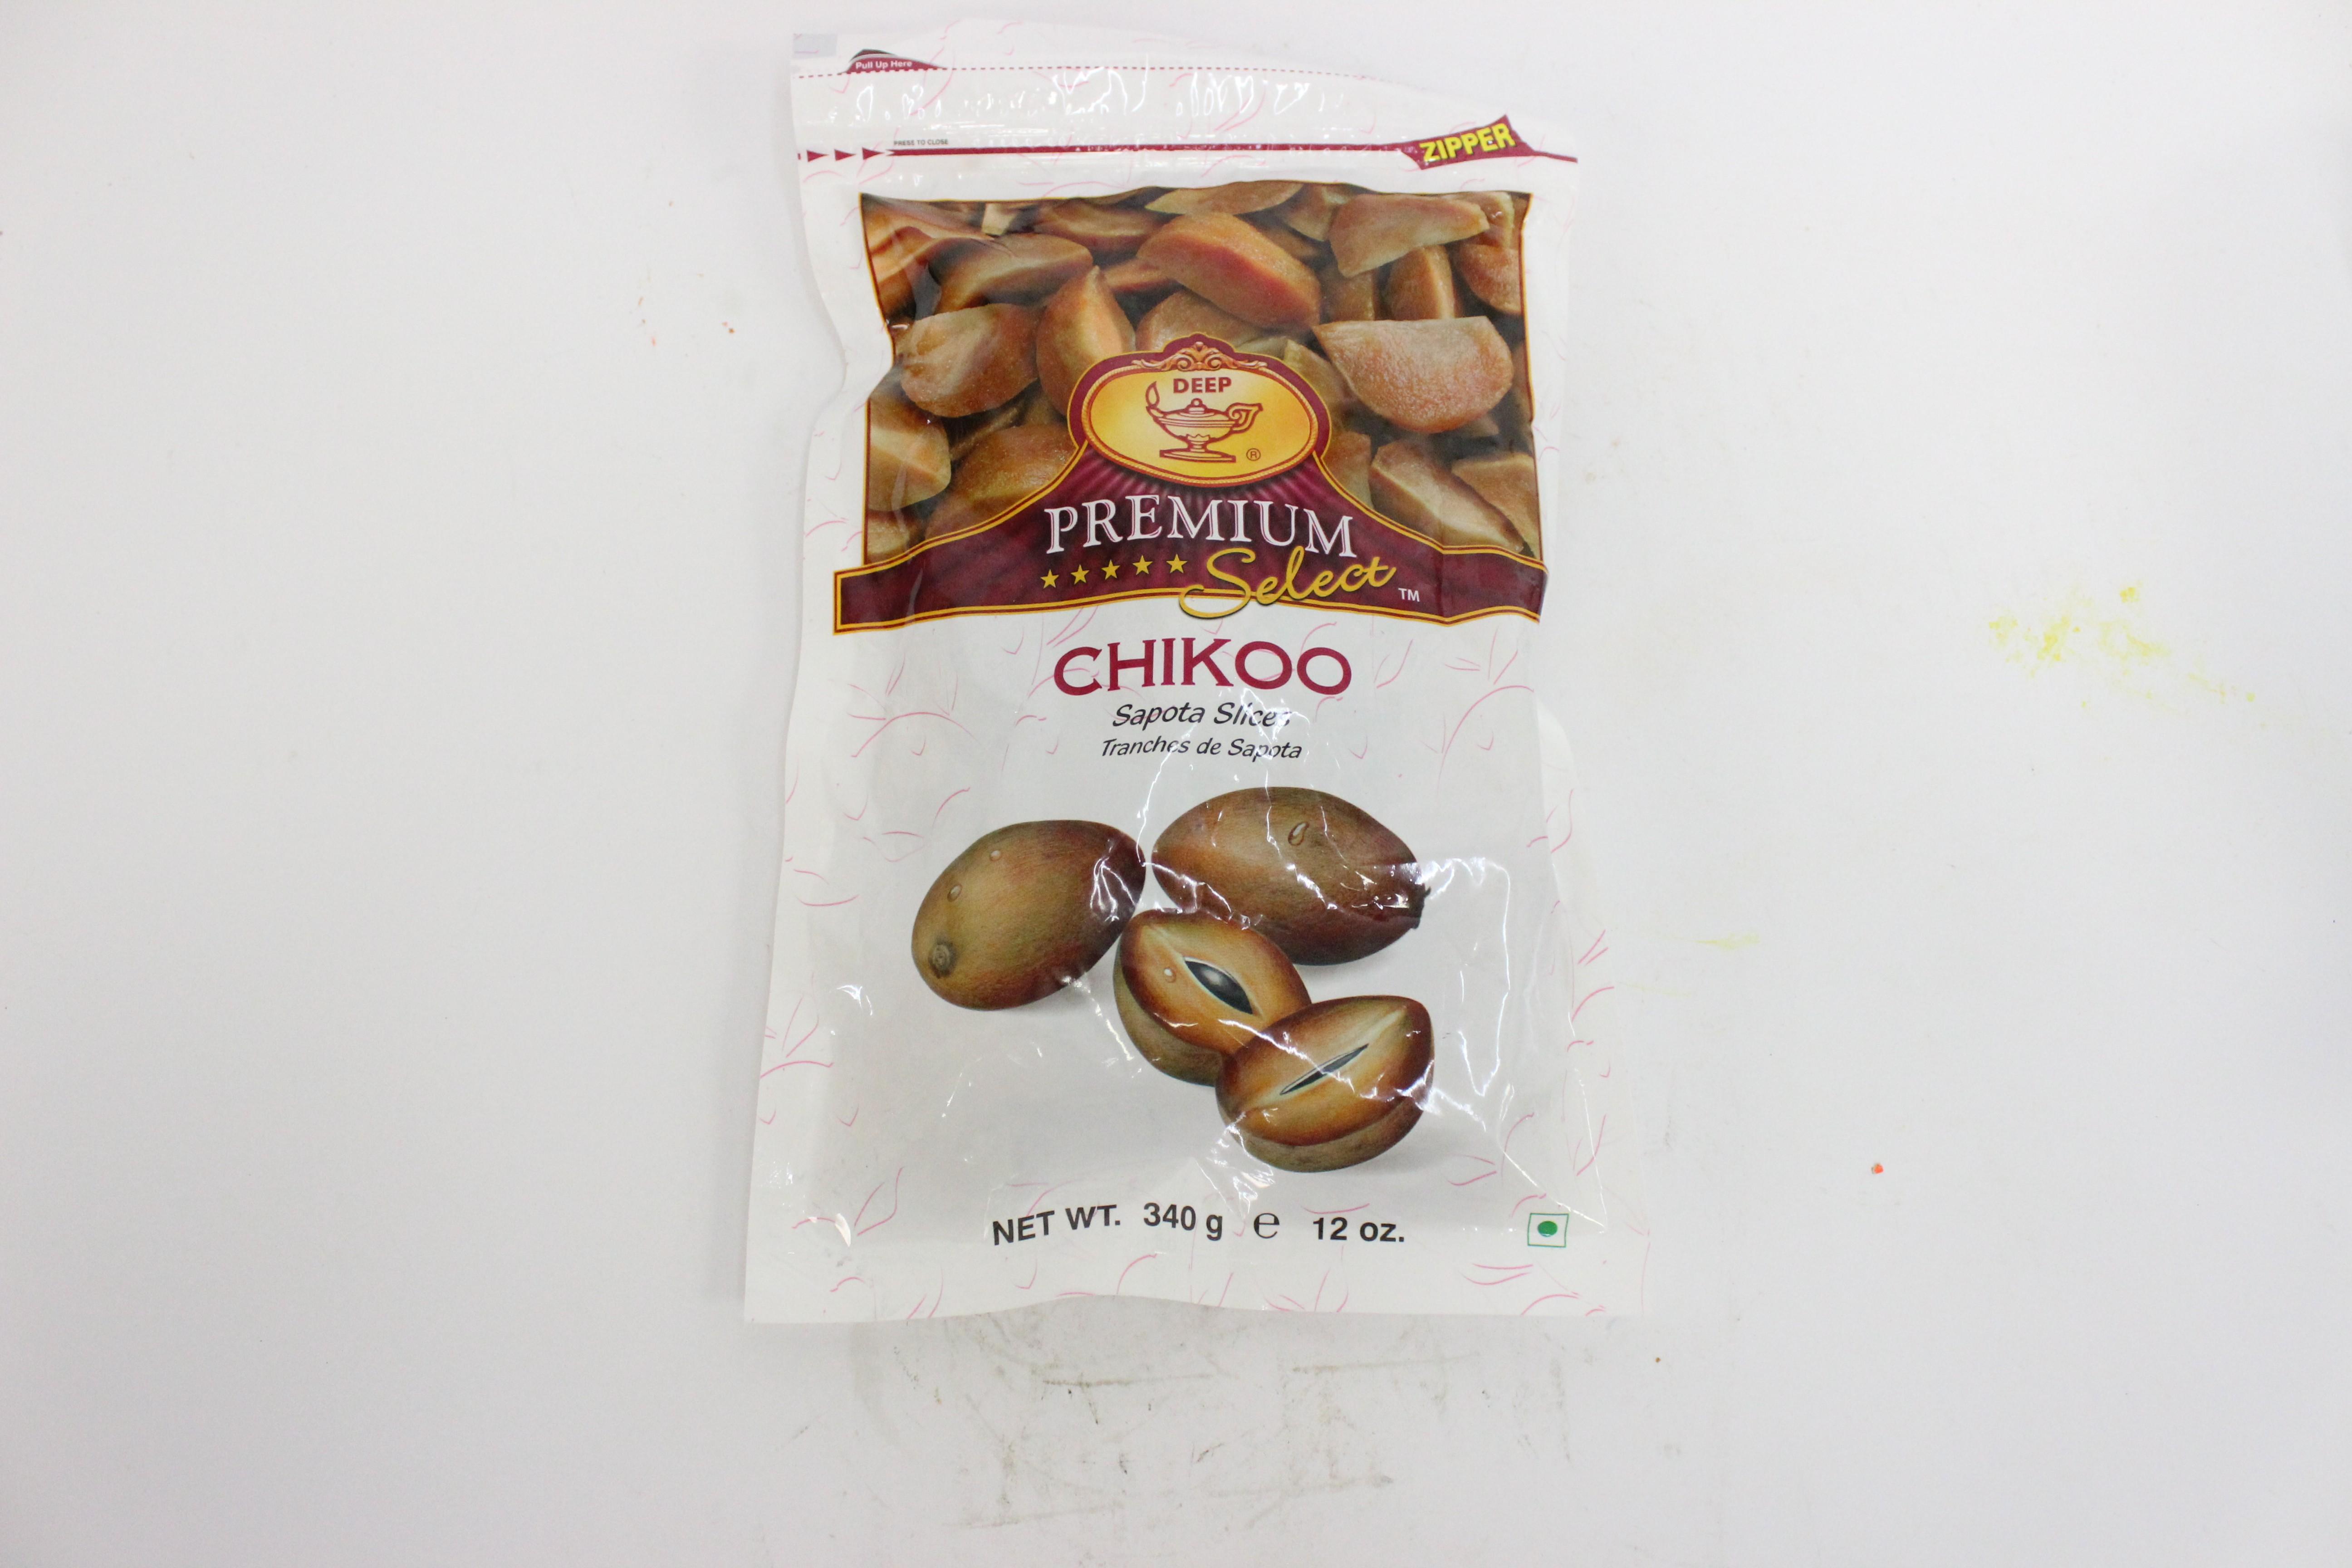 Deep Premium Chikoo 12 oz